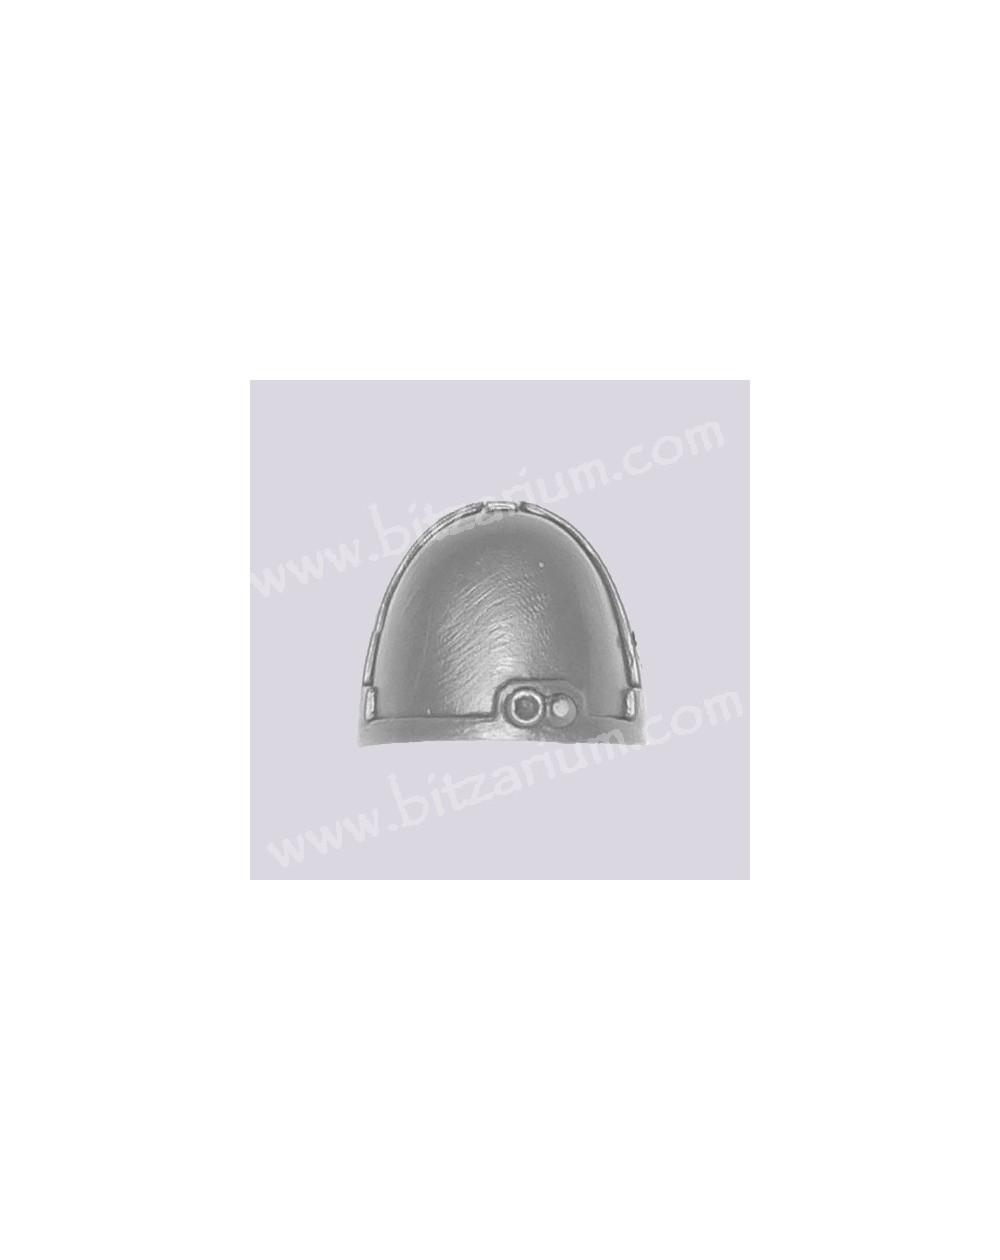 Artilleryman Shoulder Pad 1